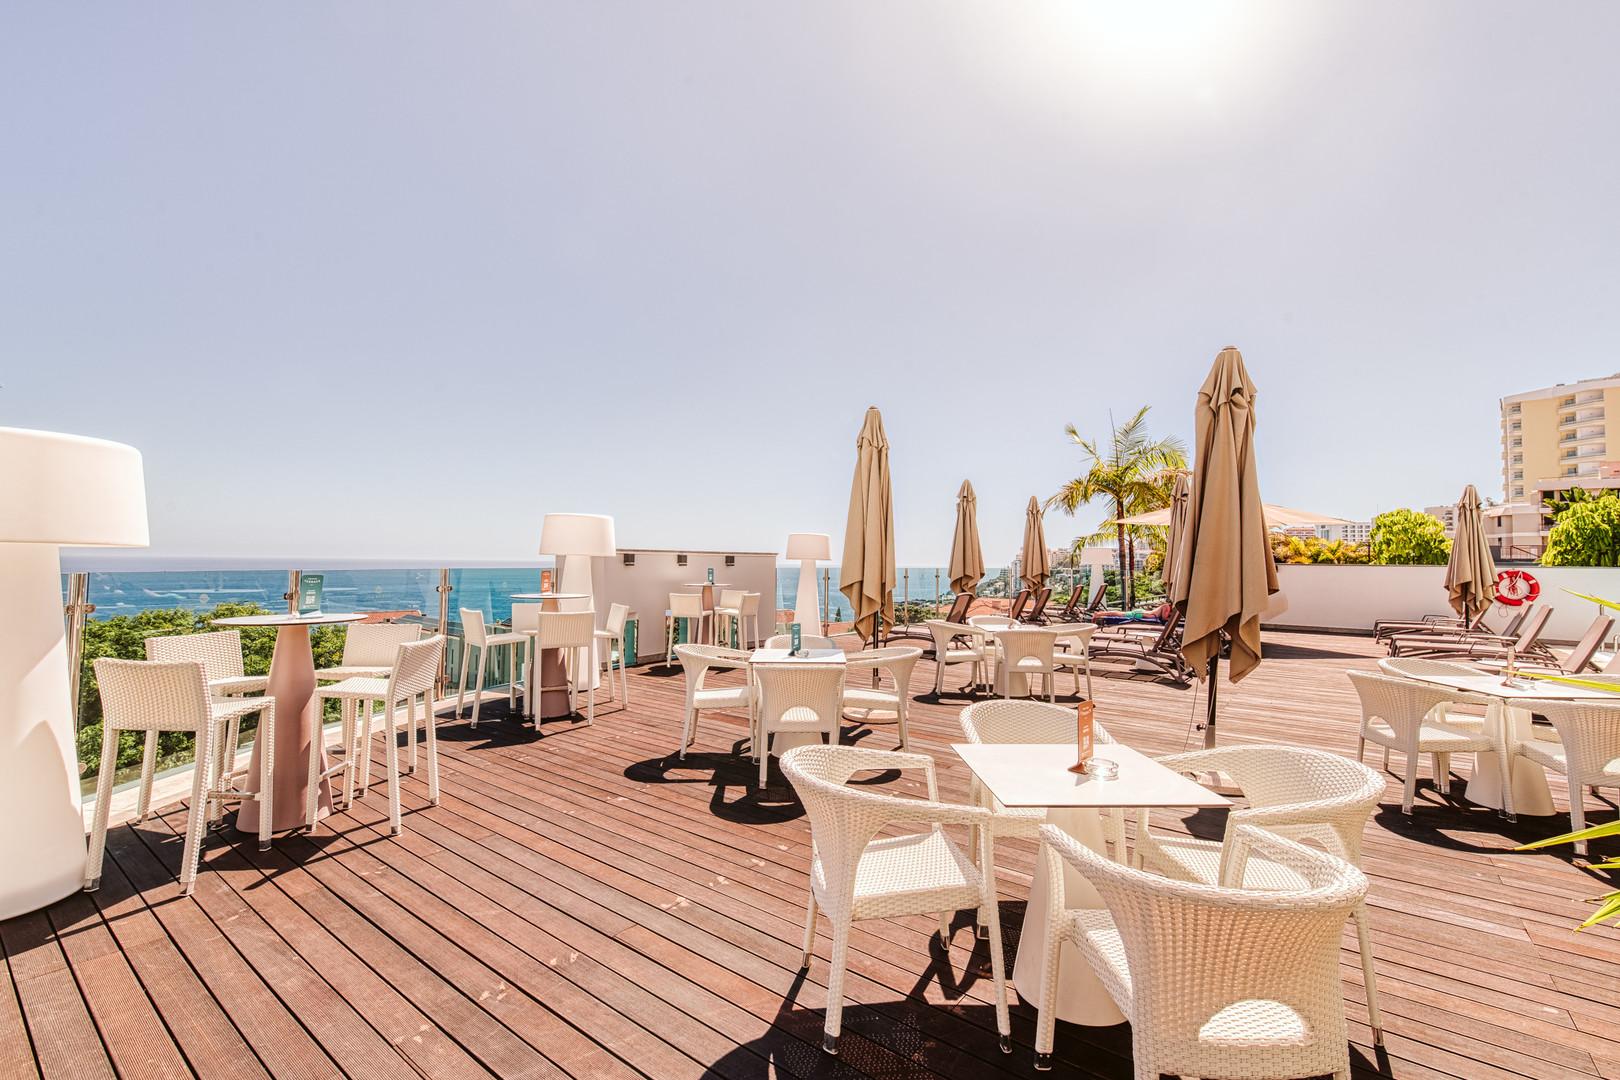 Hotel Vila Baleira Funchal #6